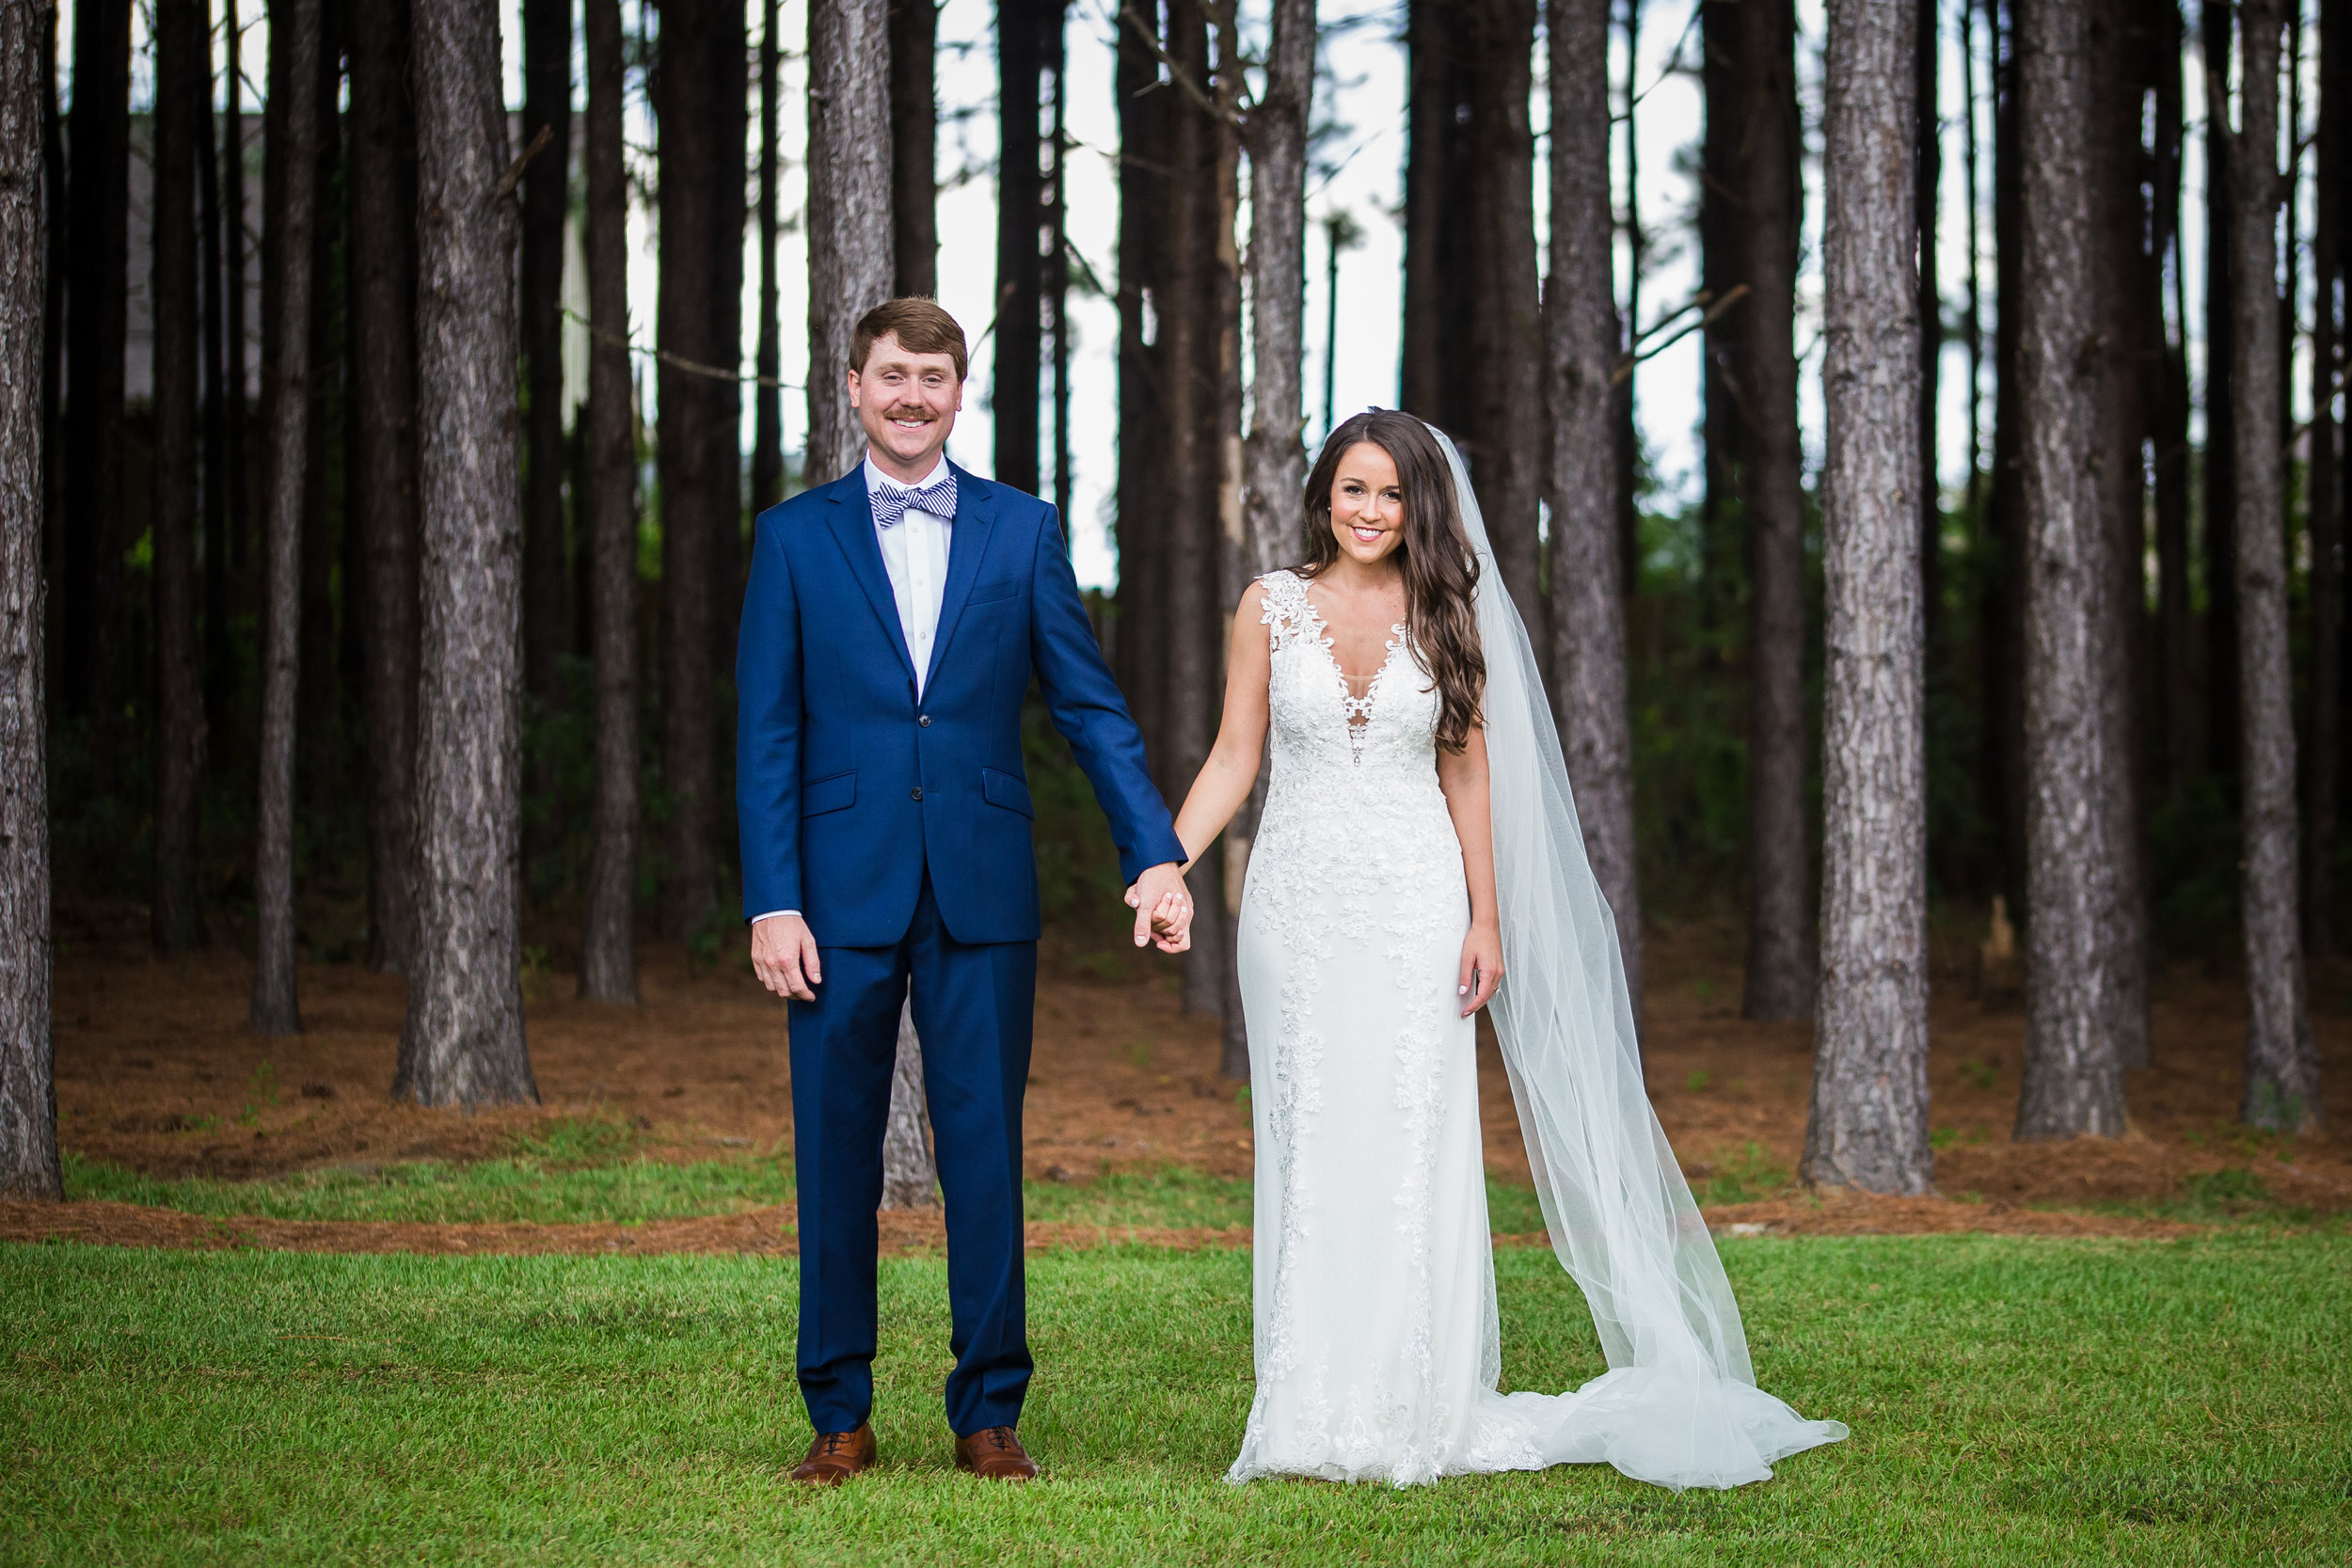 Bella-Sera-Gardens-Alabama-Mobile-Photography-Pensacola-Navarre-Fairhope-Wedding-11.jpg